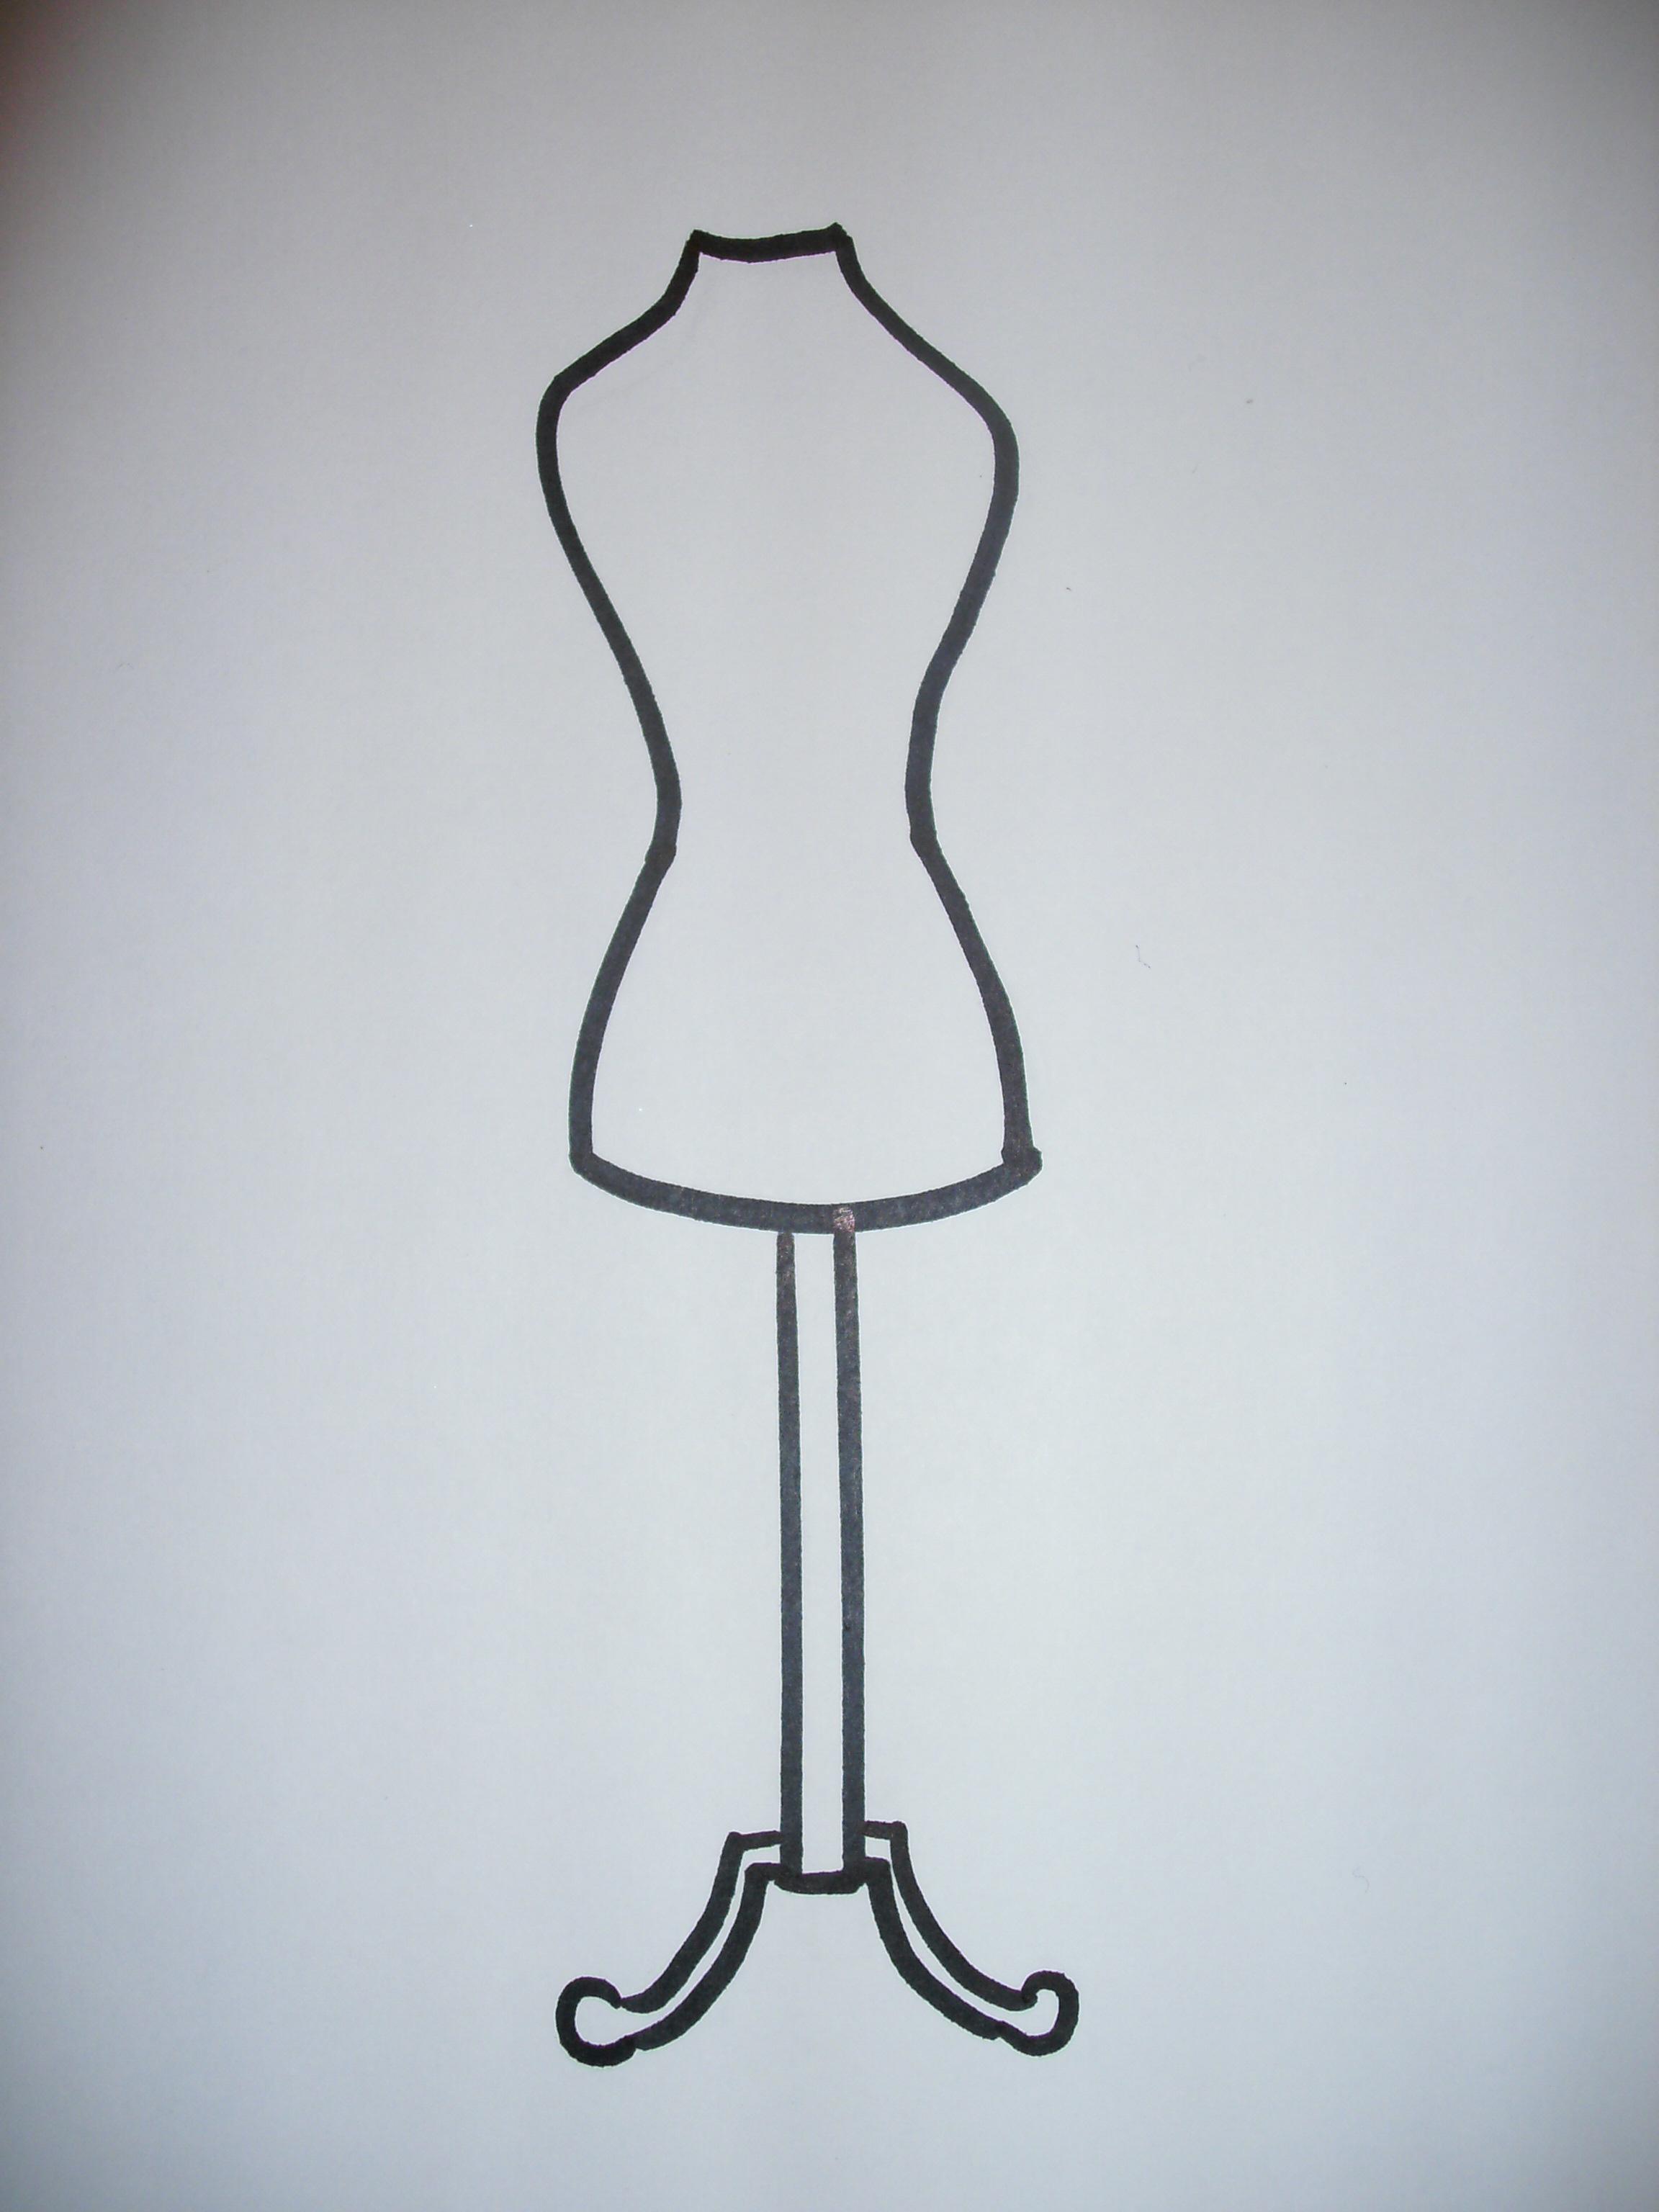 dress form outline mersn proforum co